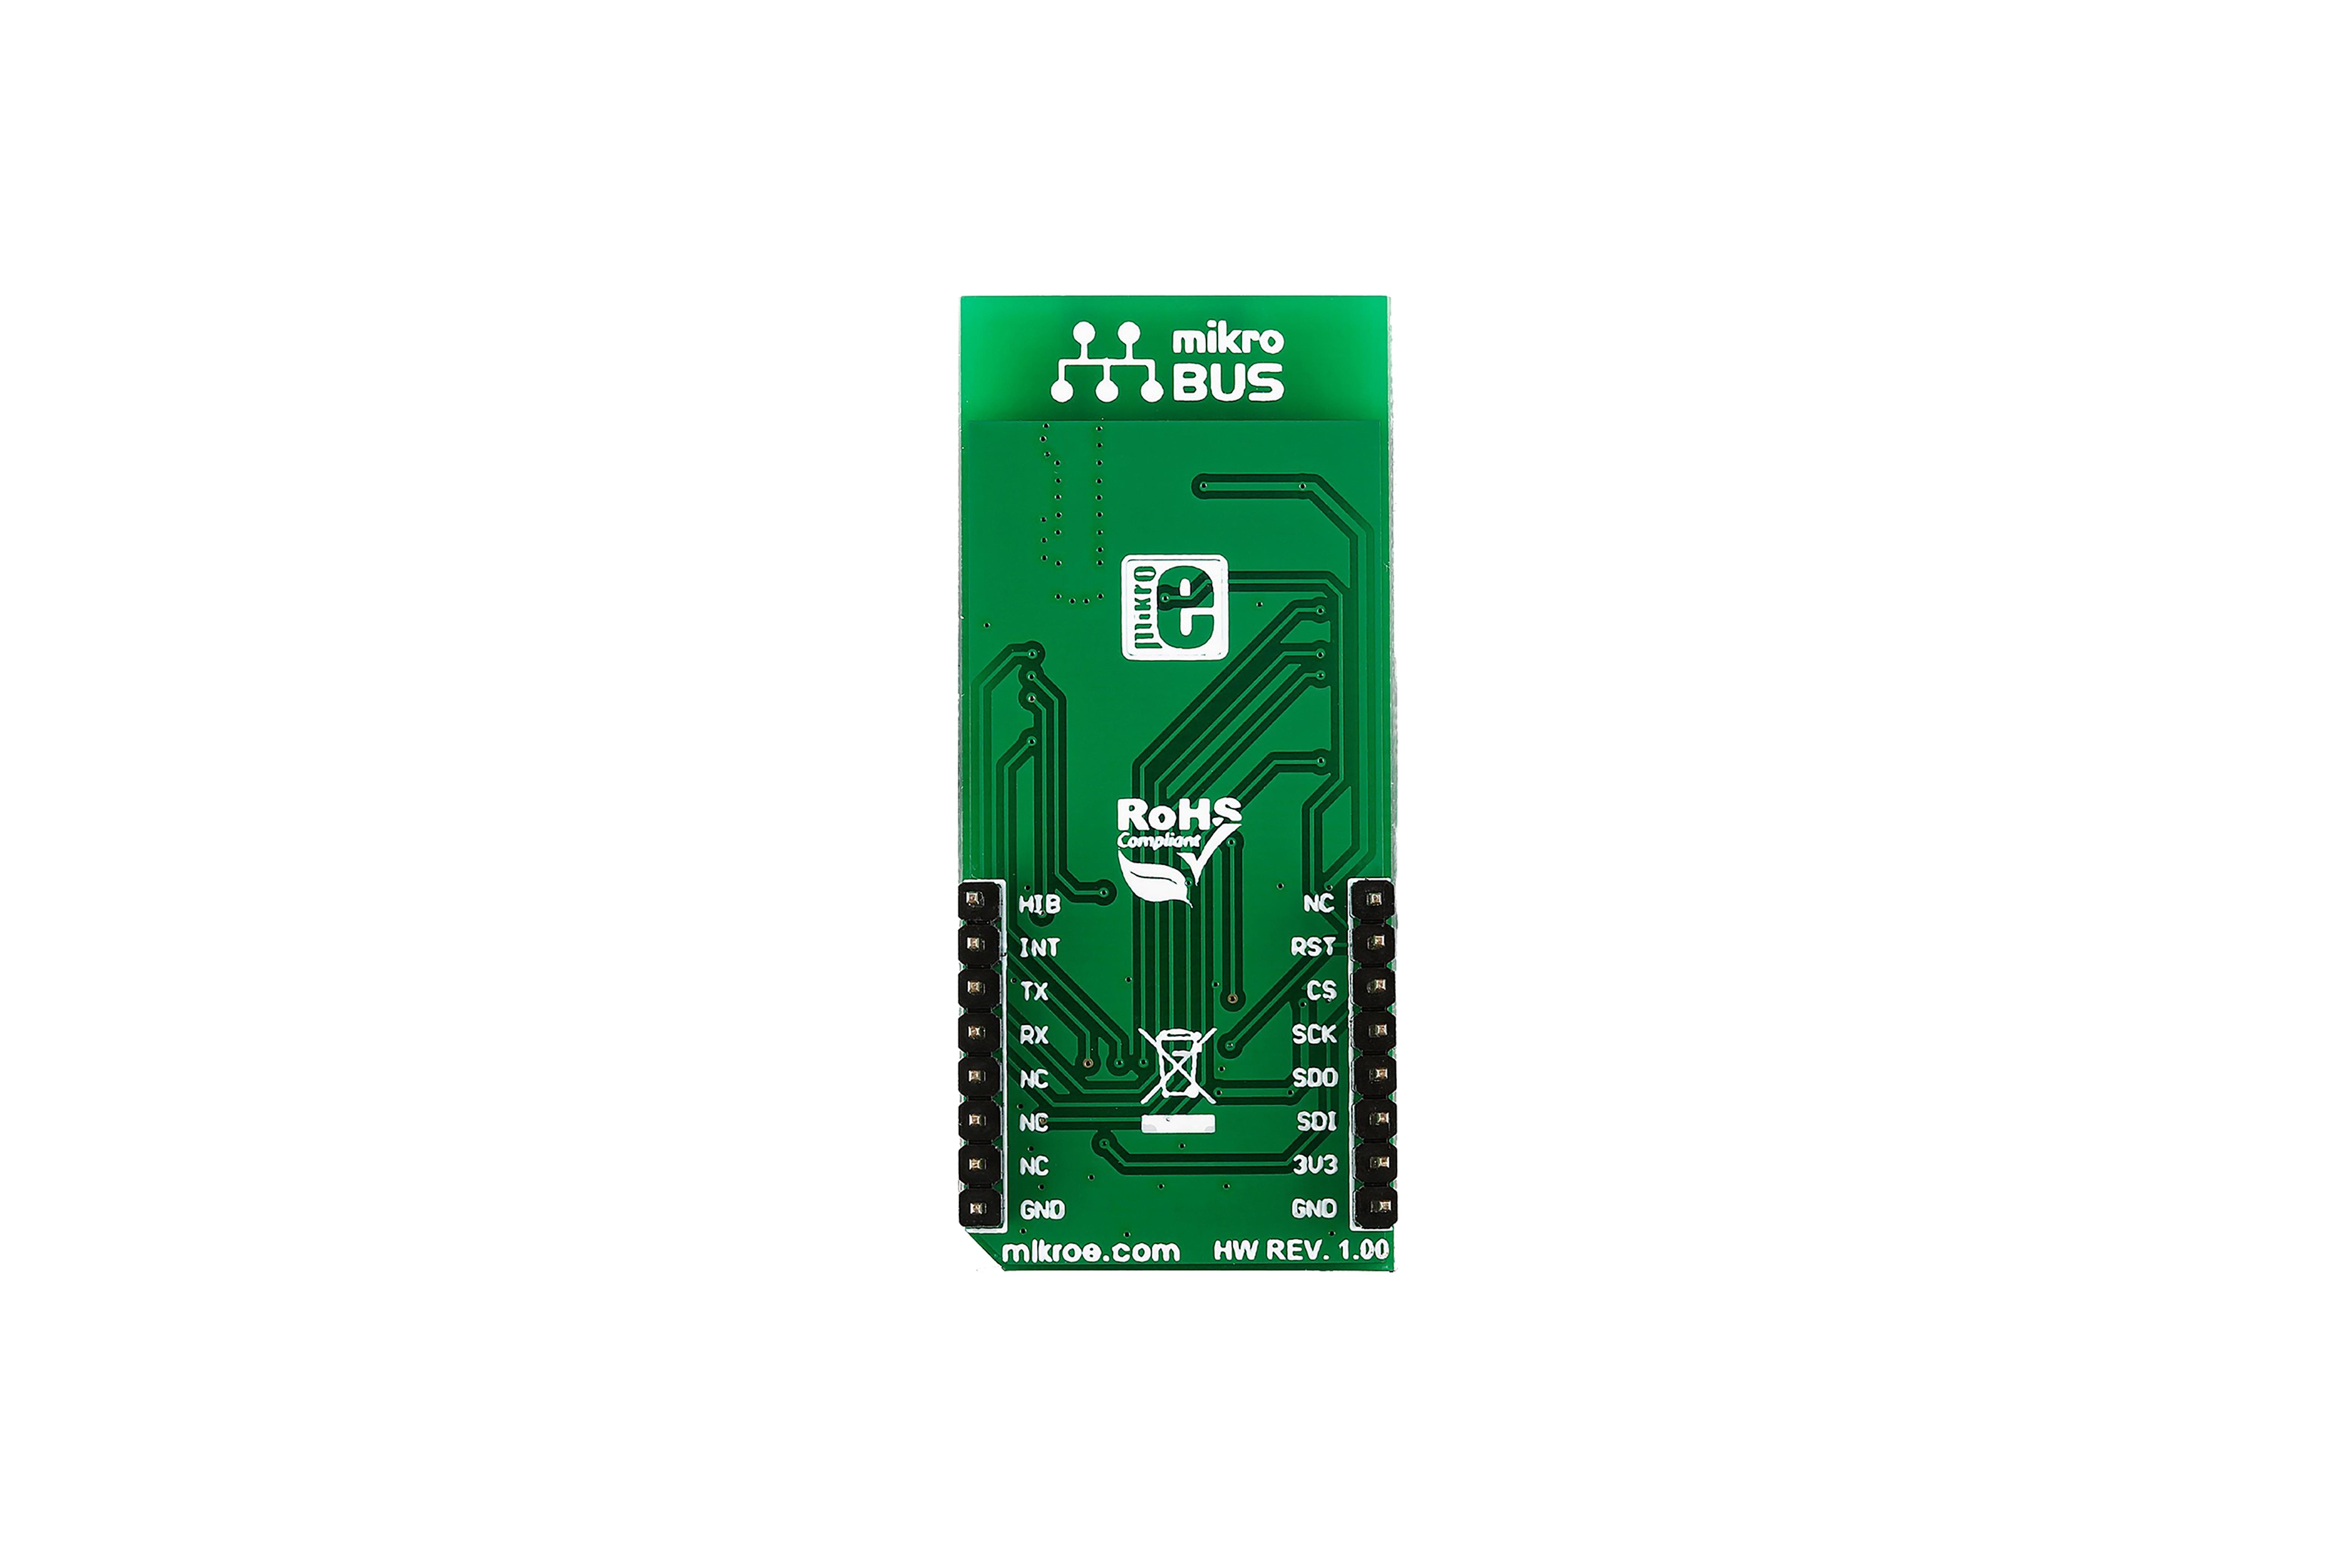 CC3100 クリック WIFI IOTボード、MIKROE-2336